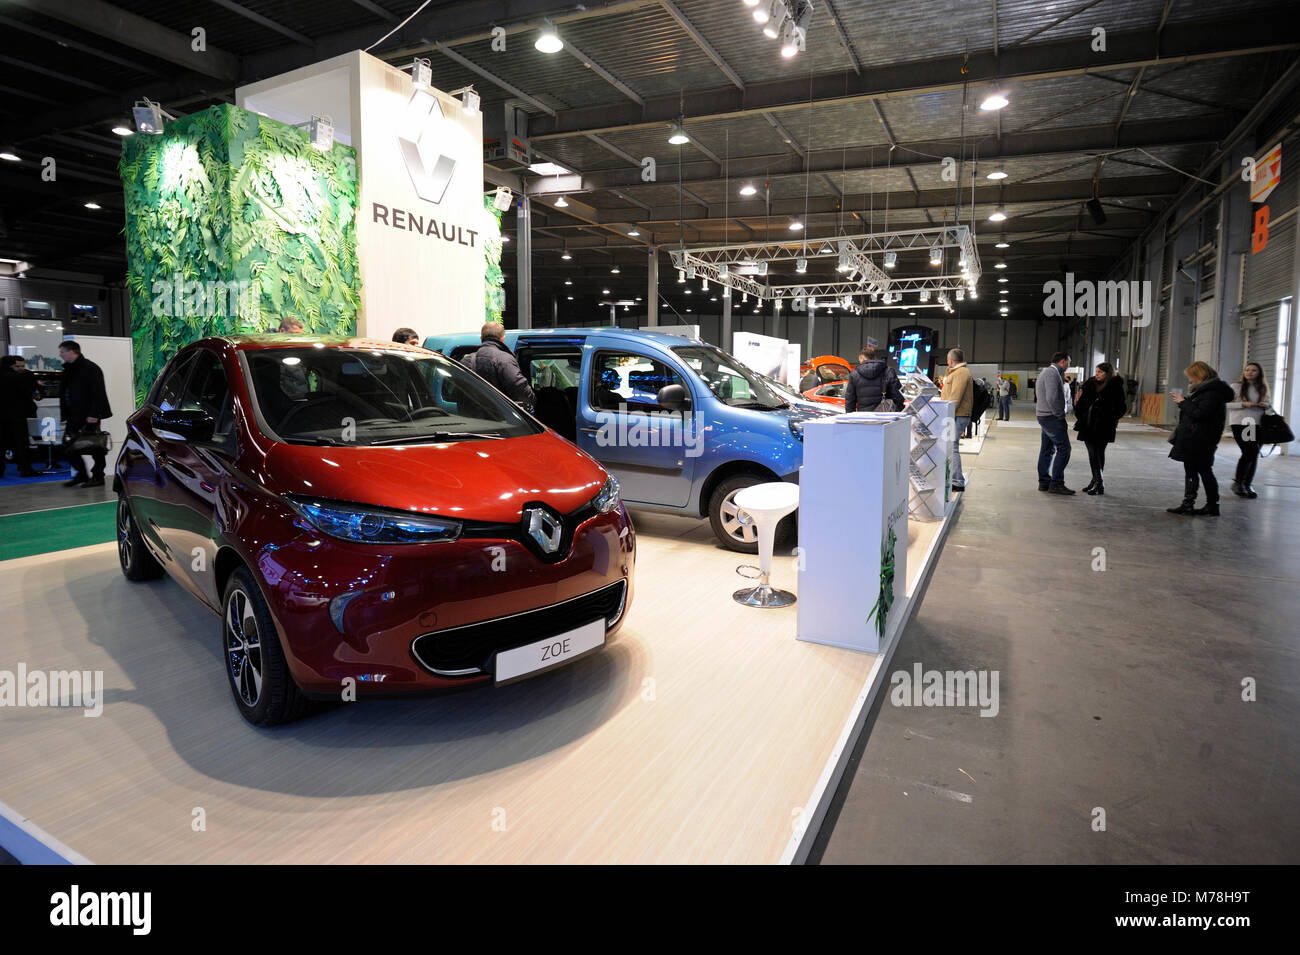 New hybrid cars demonstrated during exhibition PLUG-IN UKRAINE 2018. March 2, 2018. Kiev Expo center. Kiev, Ukraine - Stock Image